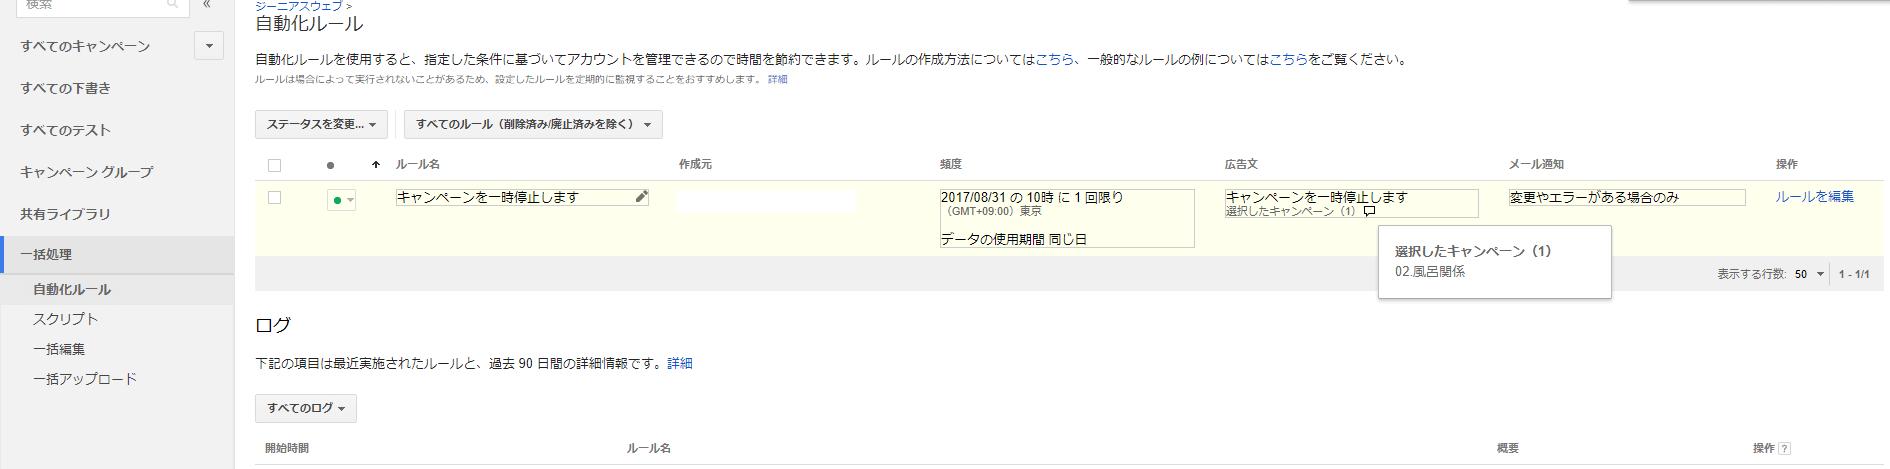 2017-08-22_11h44_31